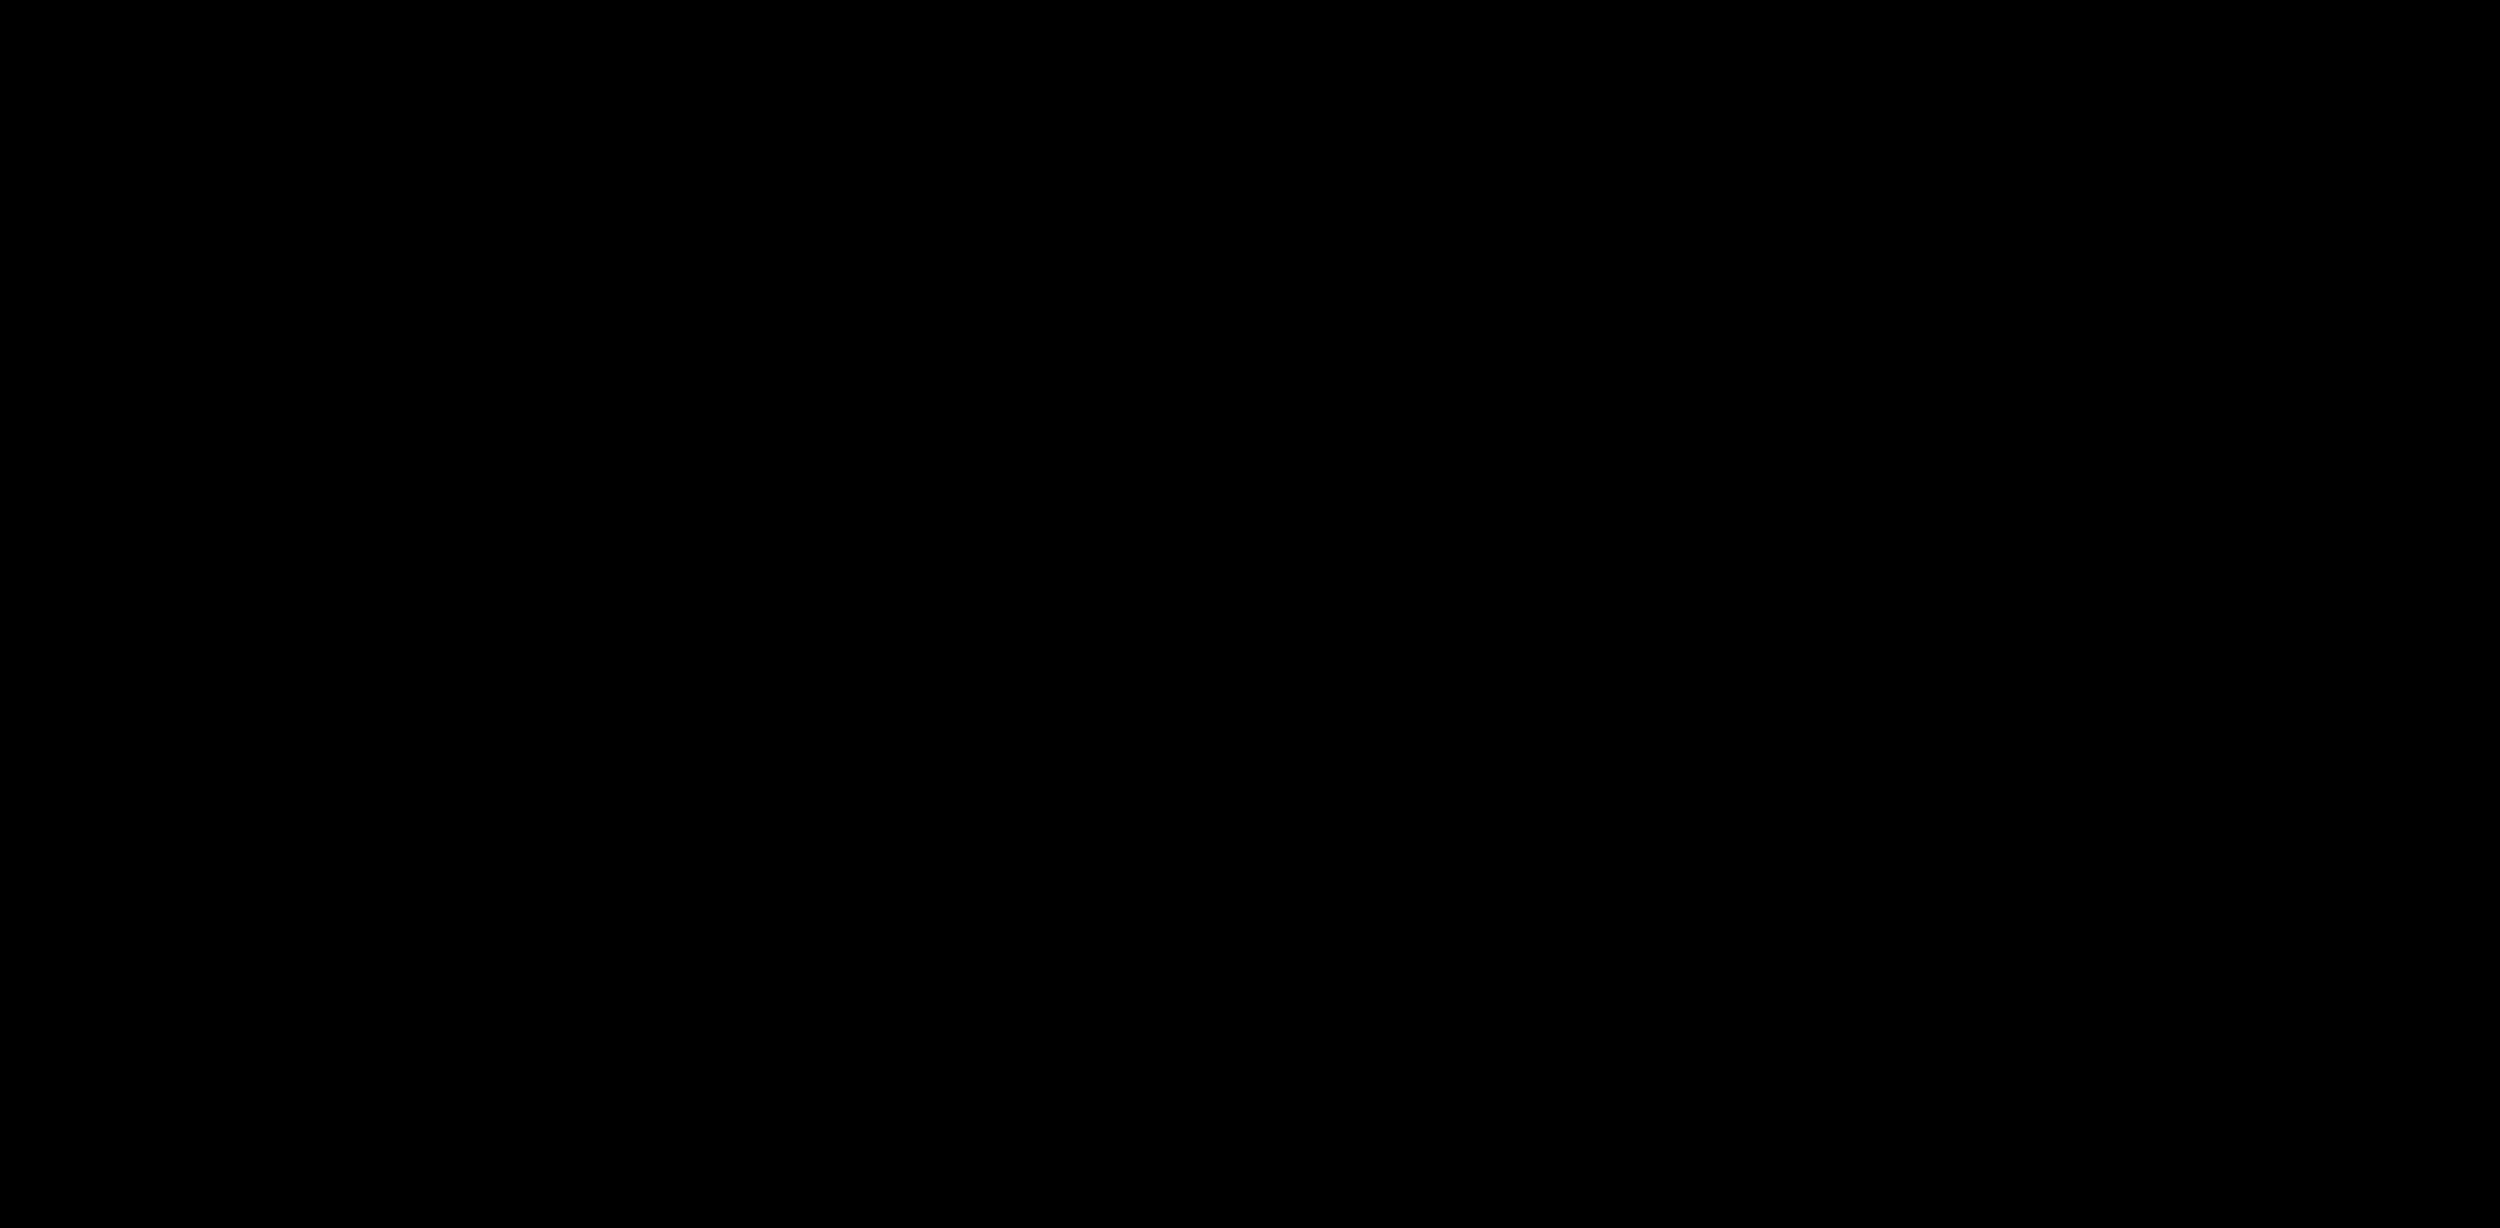 PapcercutLogo-Transparent (2).png